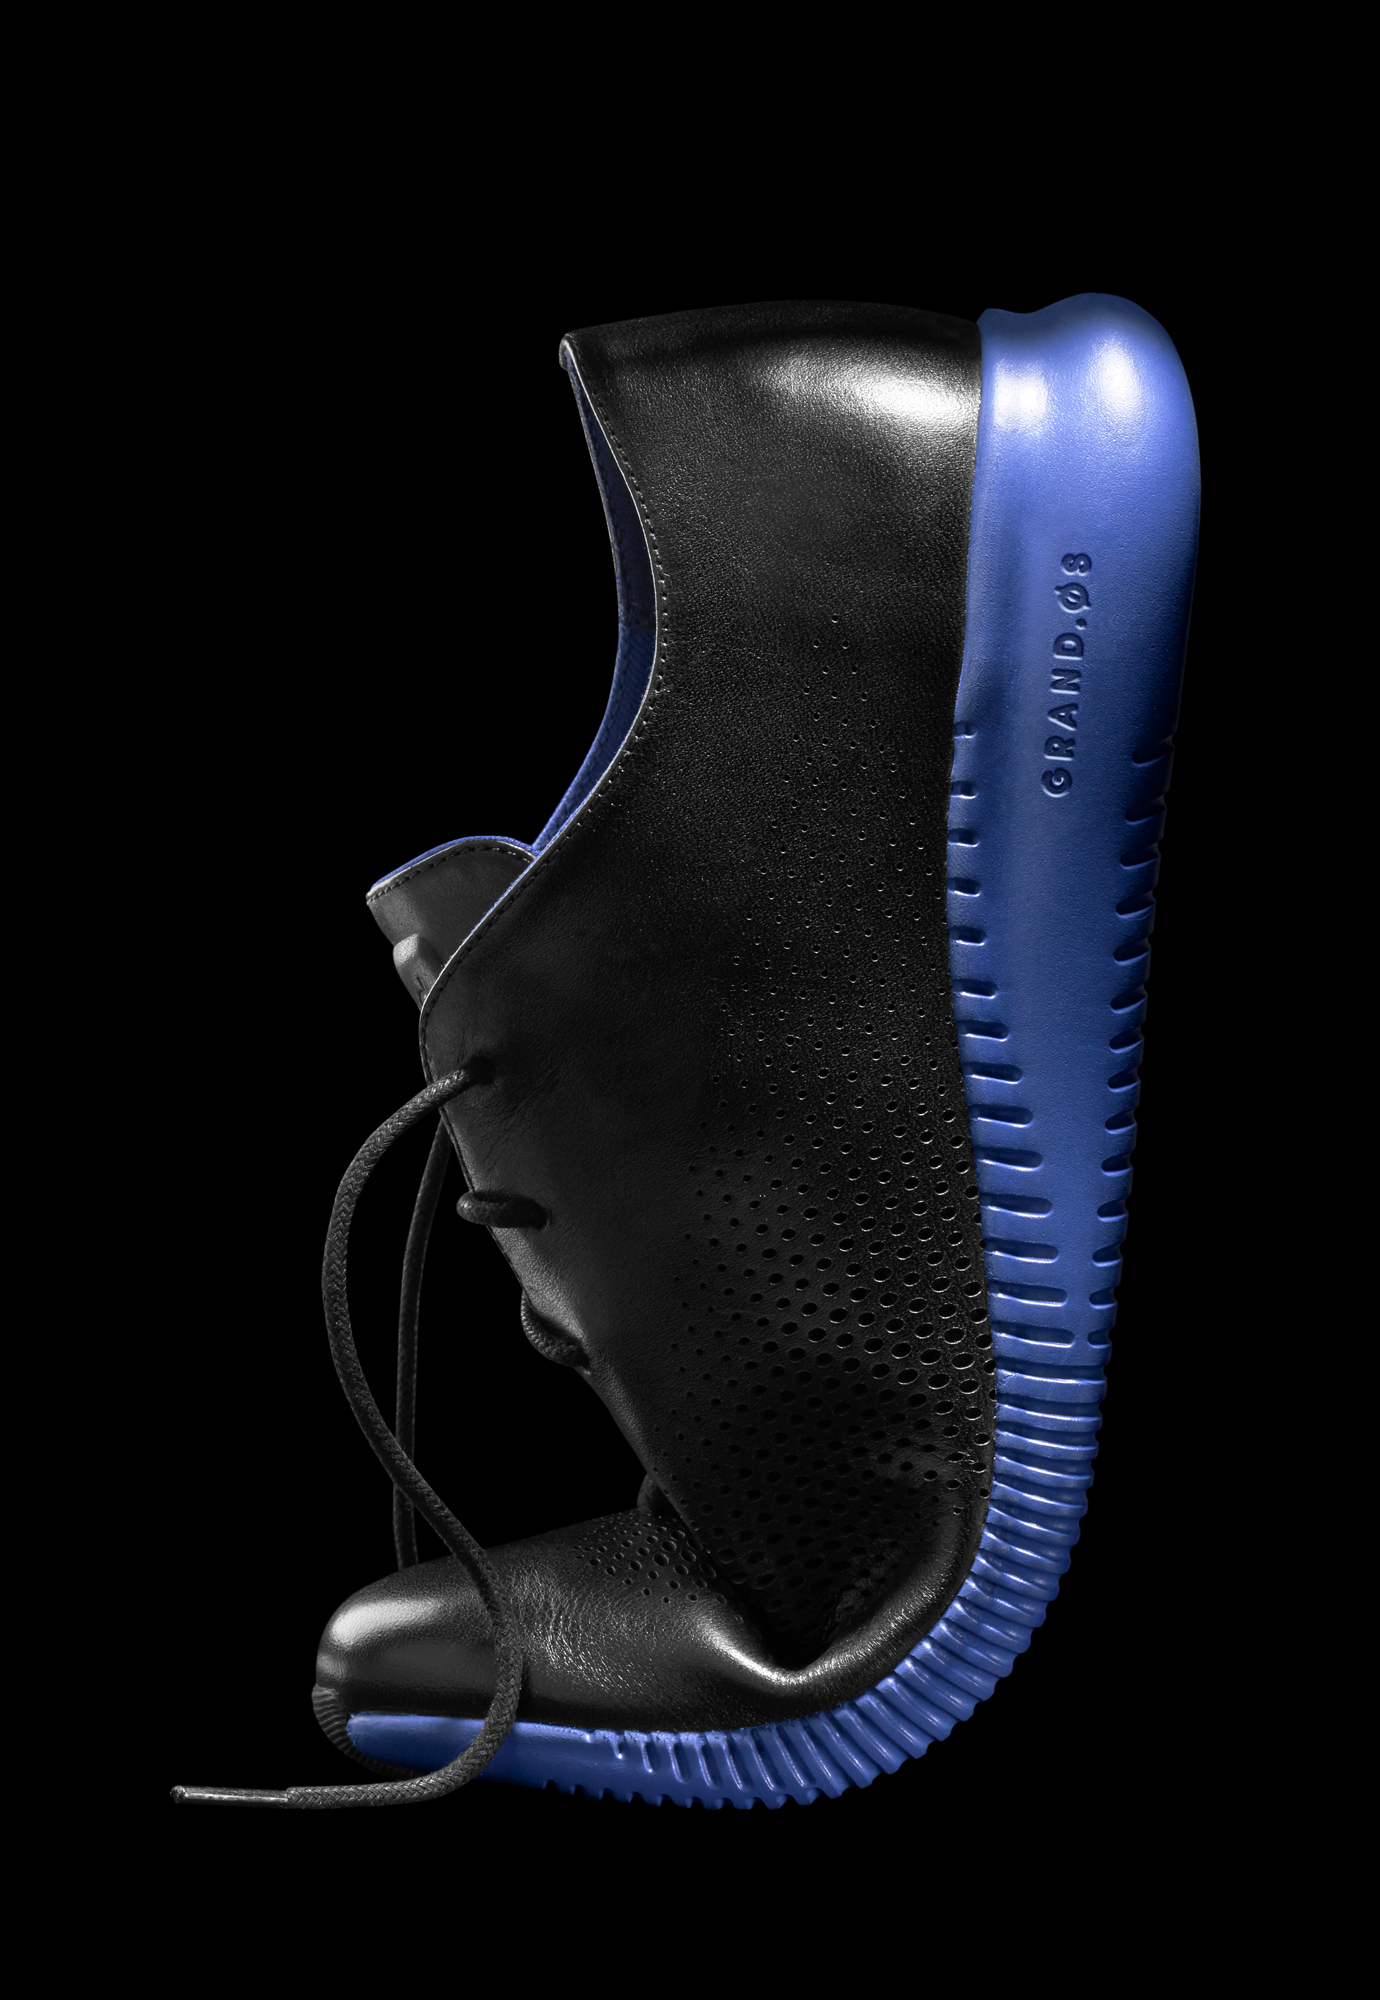 Cole Haan Fall 2016 – Women's 2.ZERØGRAND Laser Wingtip Oxford – Black/Bristol Blue